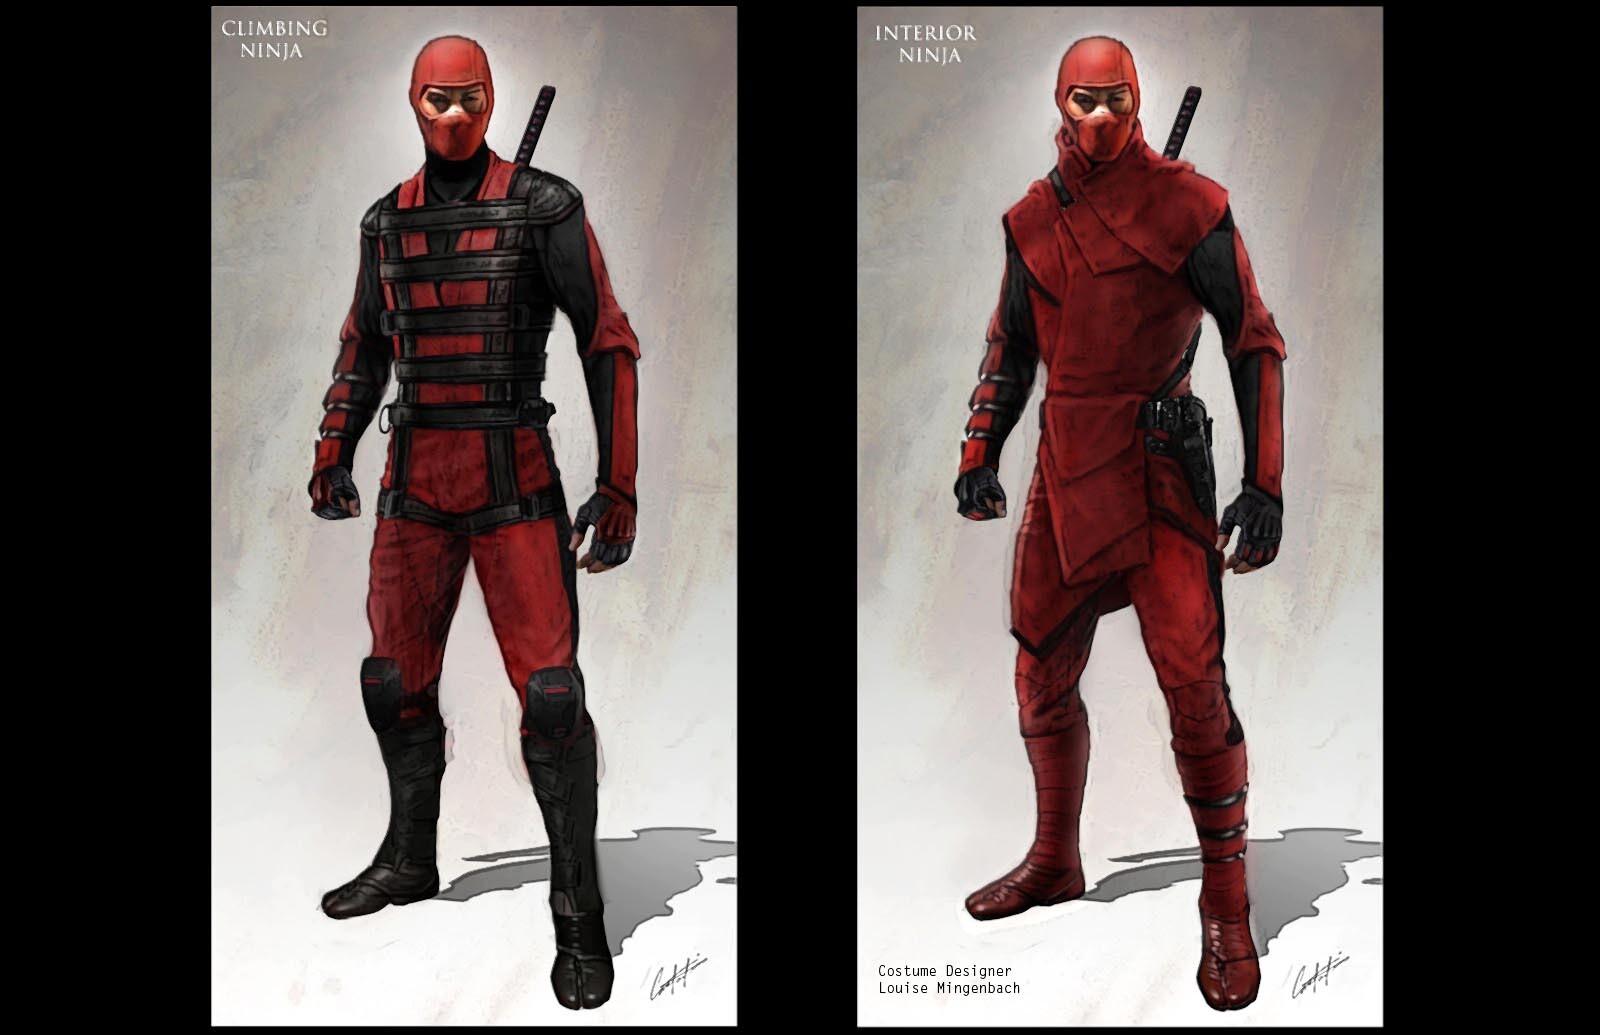 Red Ninja Costume Concepts